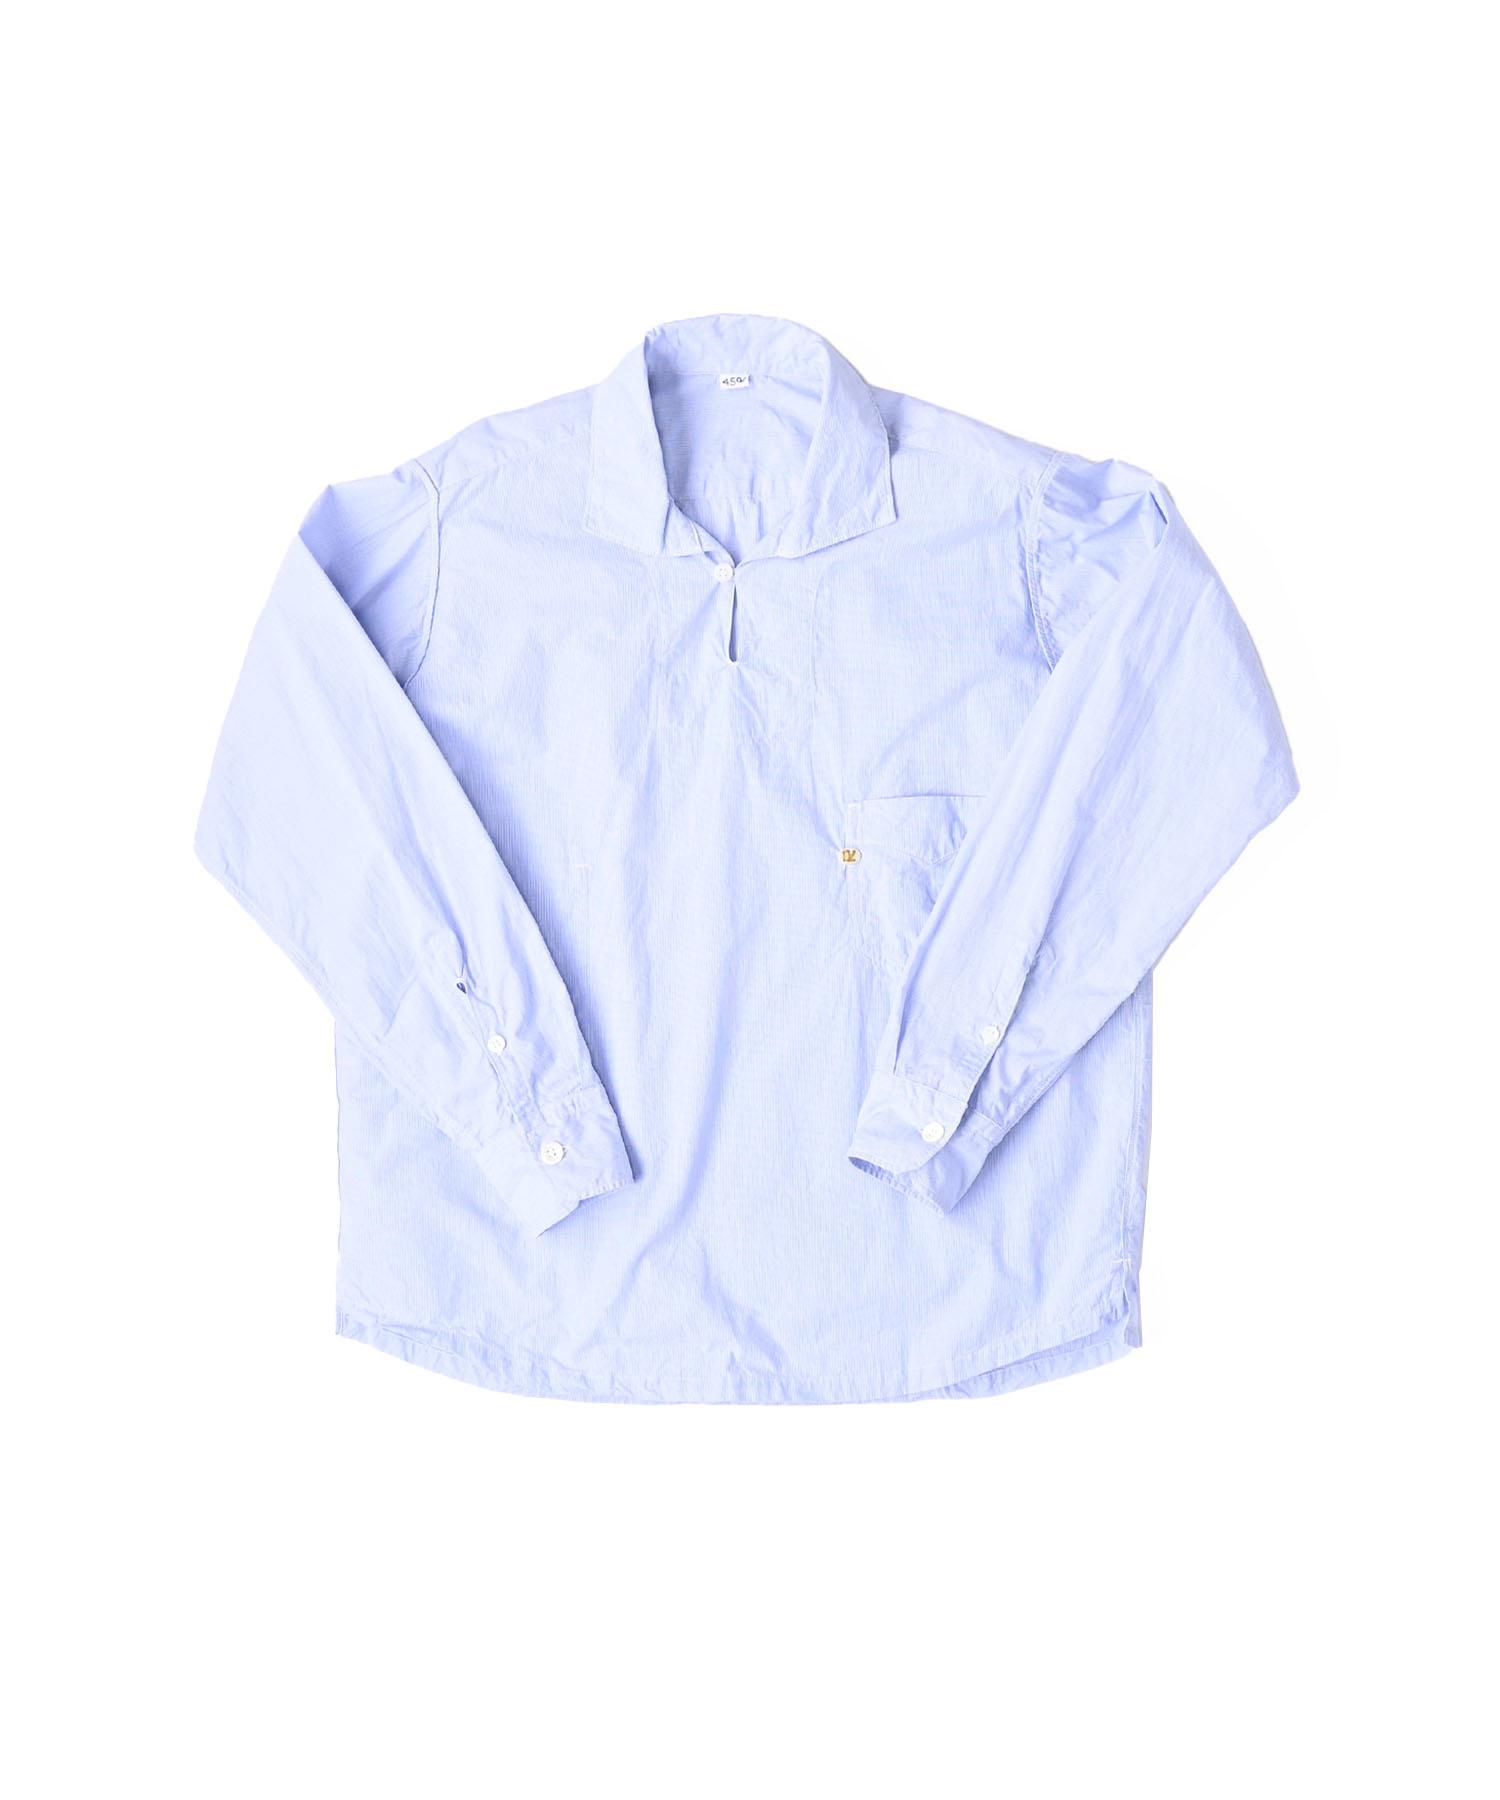 Damp Yarn Dyed 908 Ocean Pullover Shirt (0421)-1